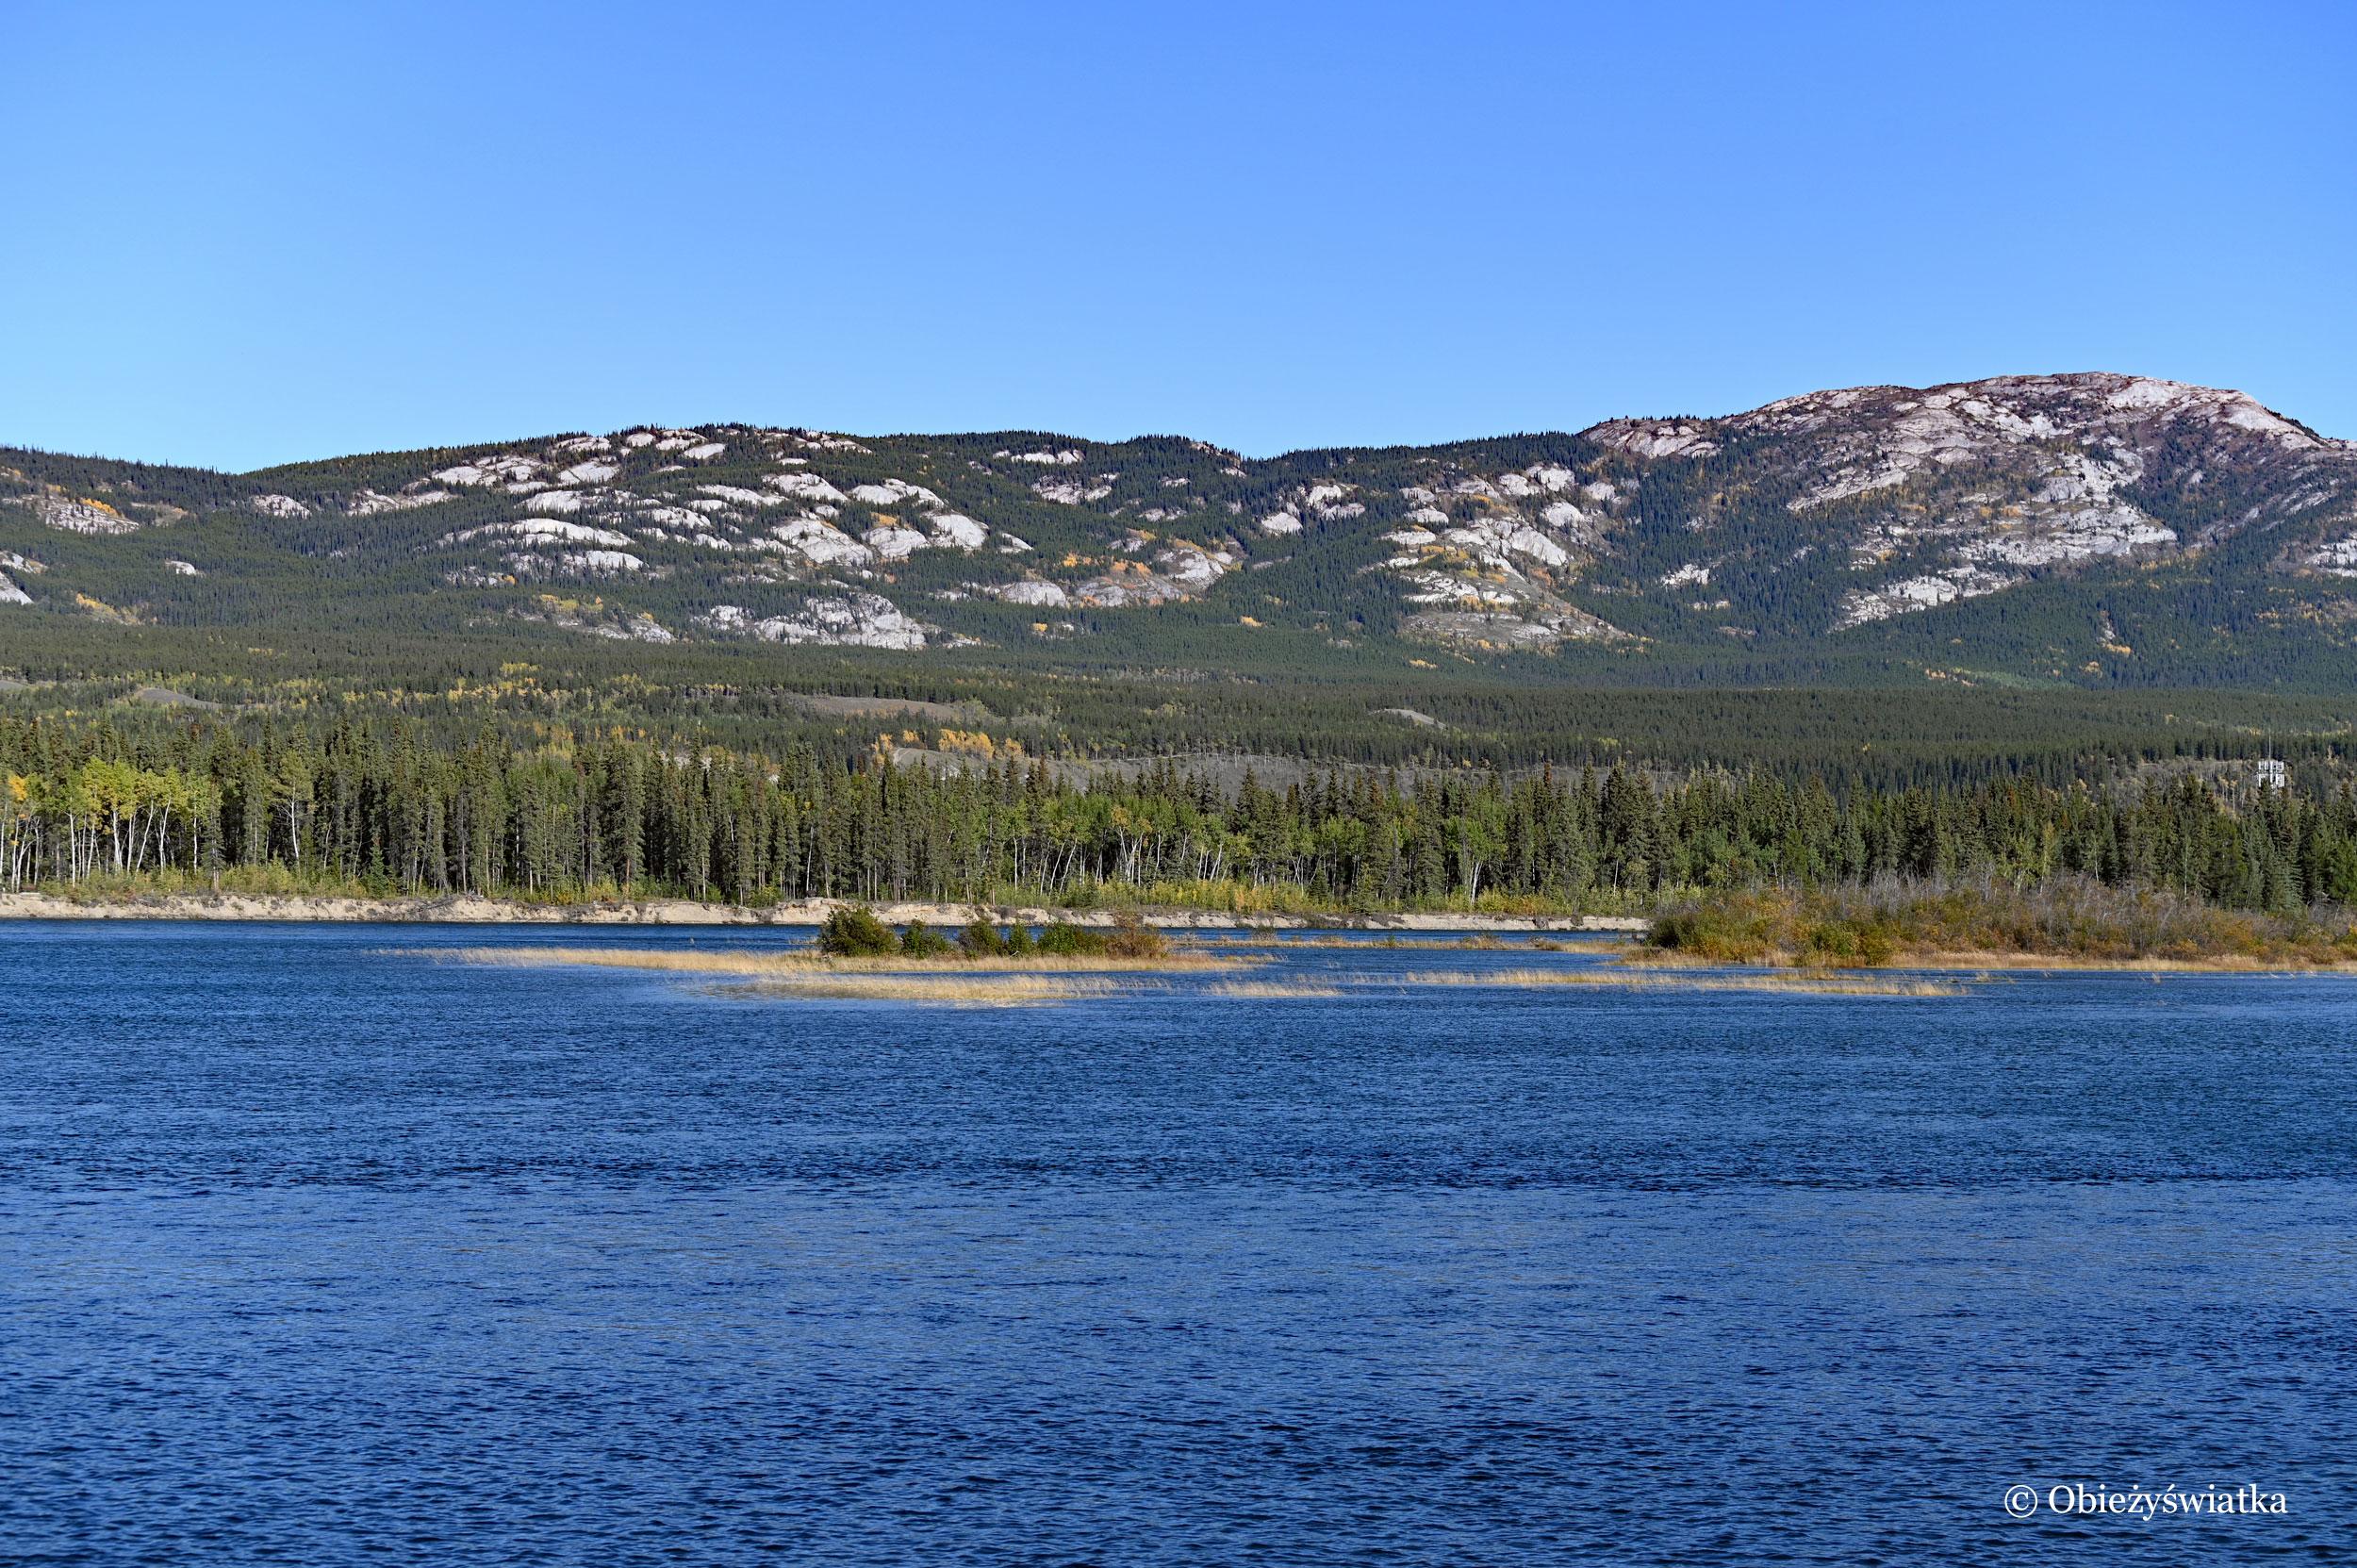 Piękna rzeka Yukon, Whitehorse, Kanada